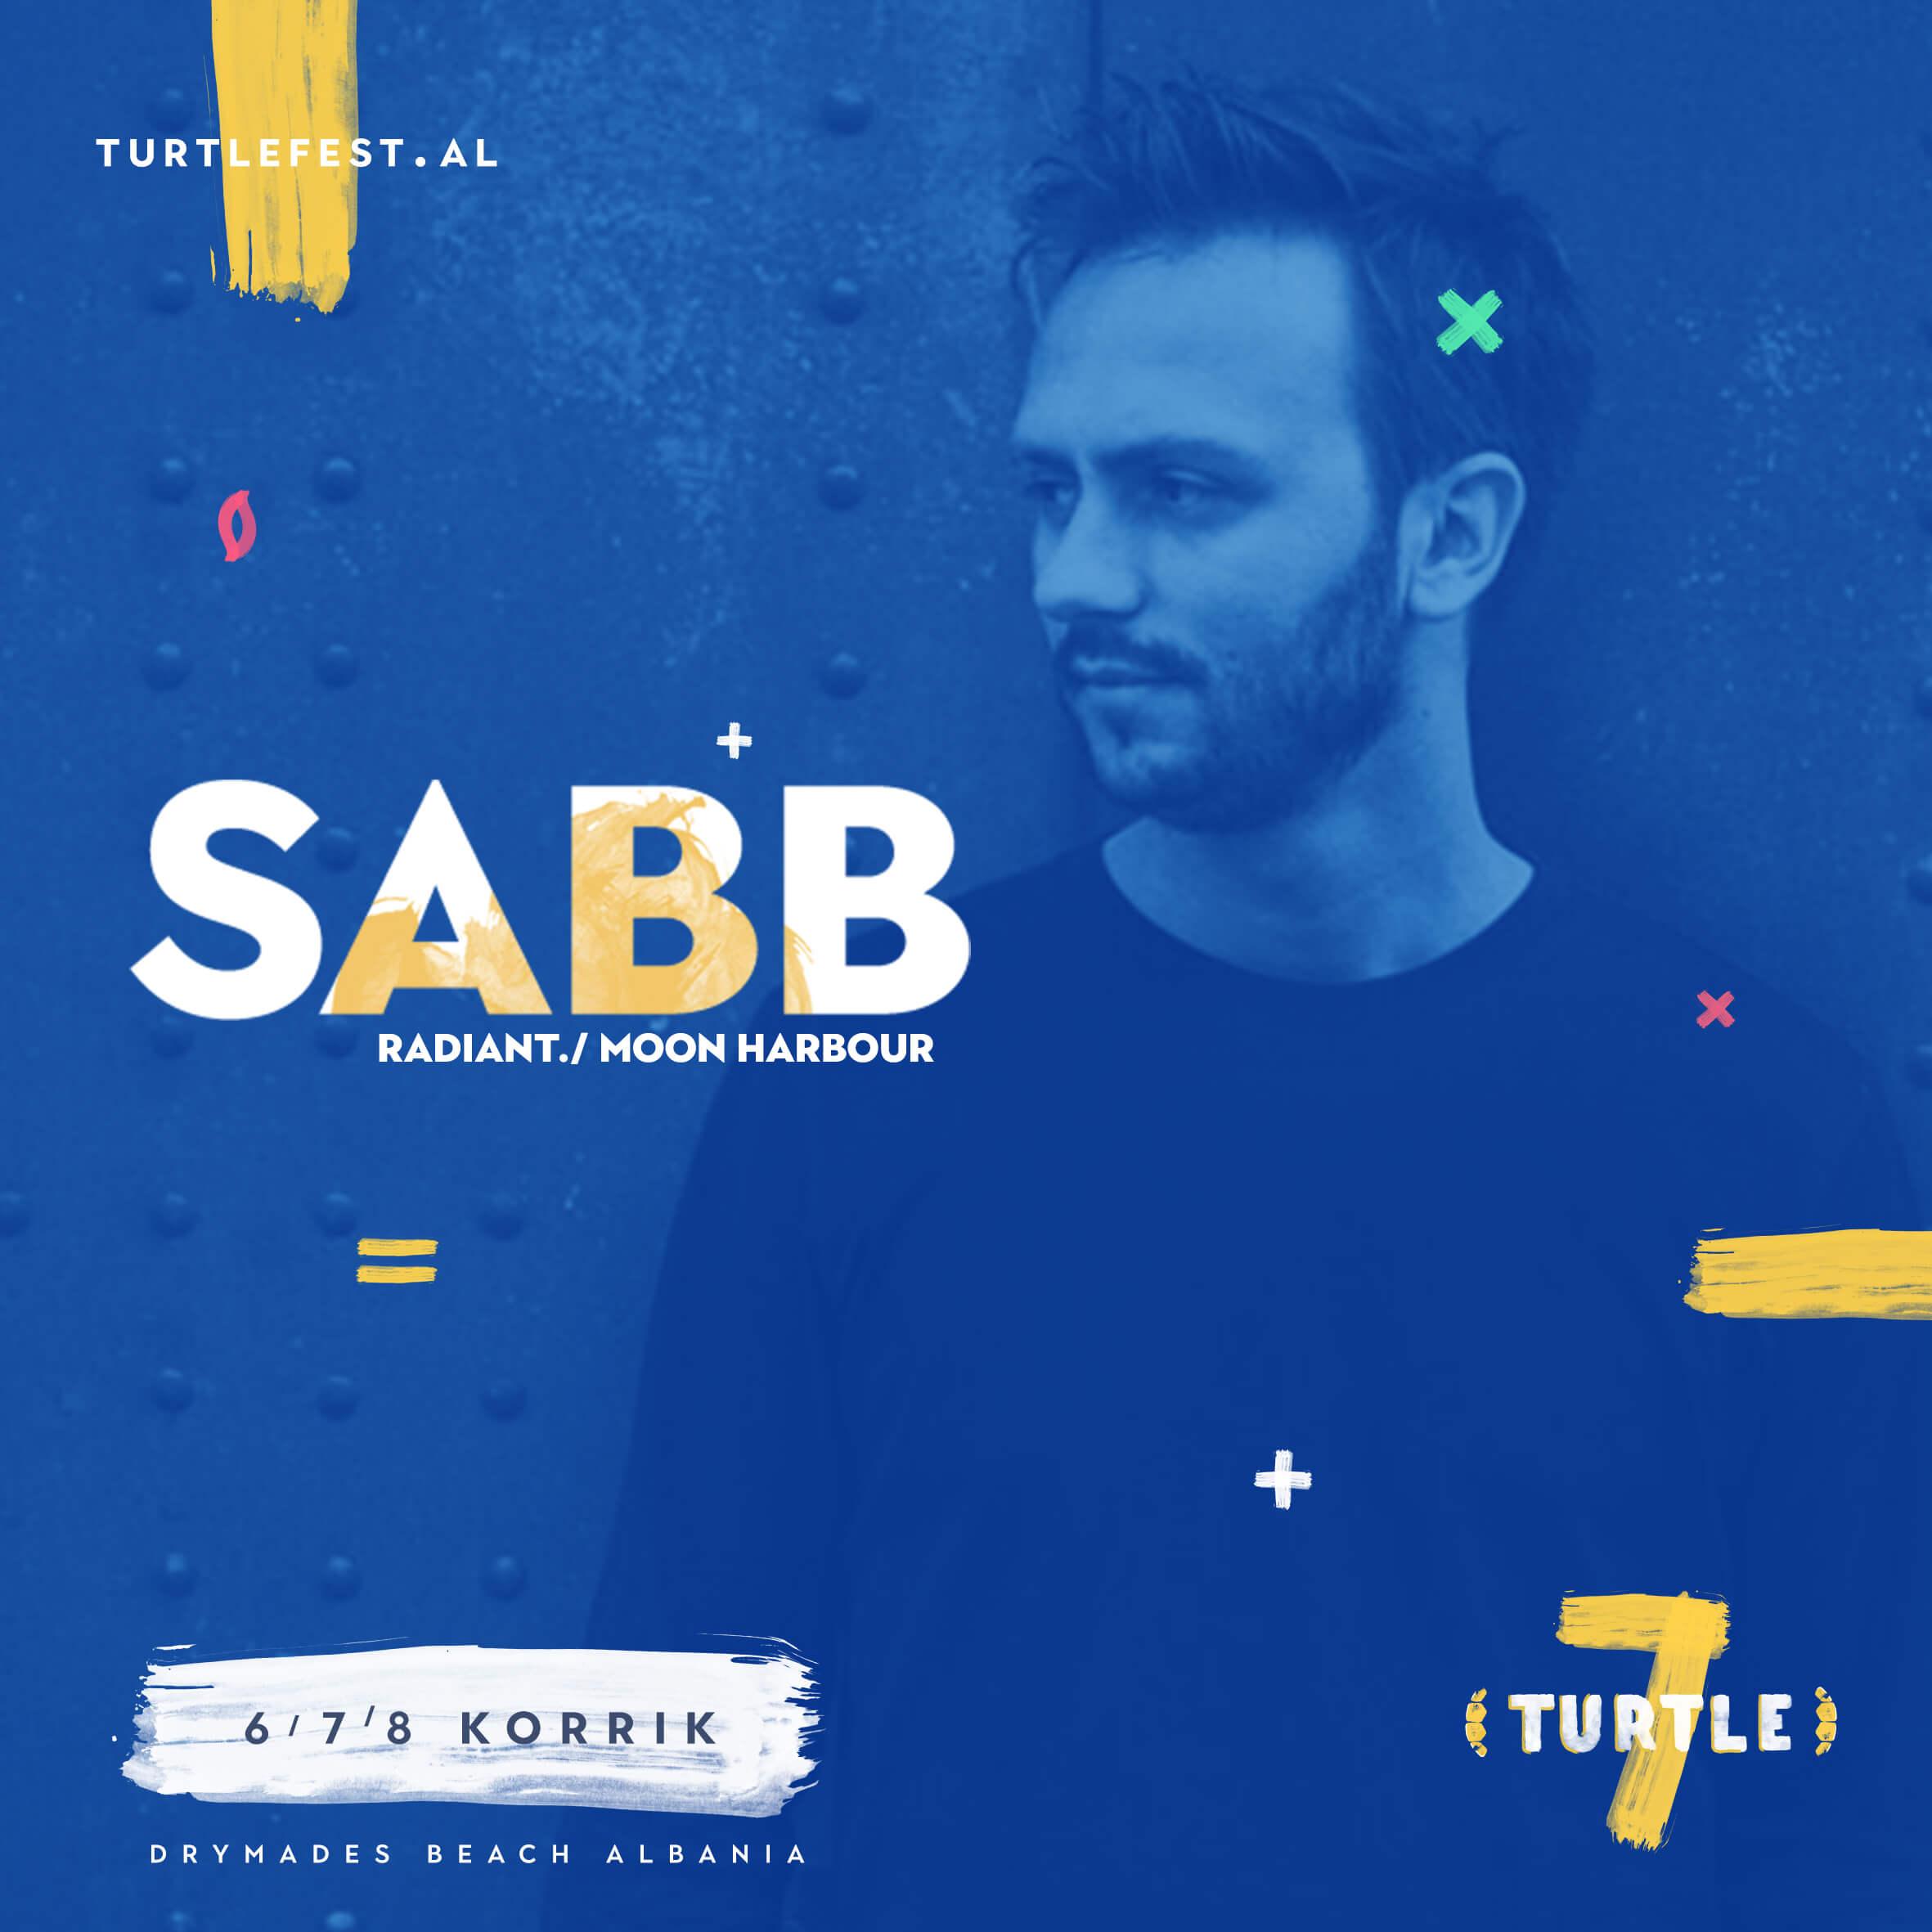 Dj Sabb - Turtle Fest